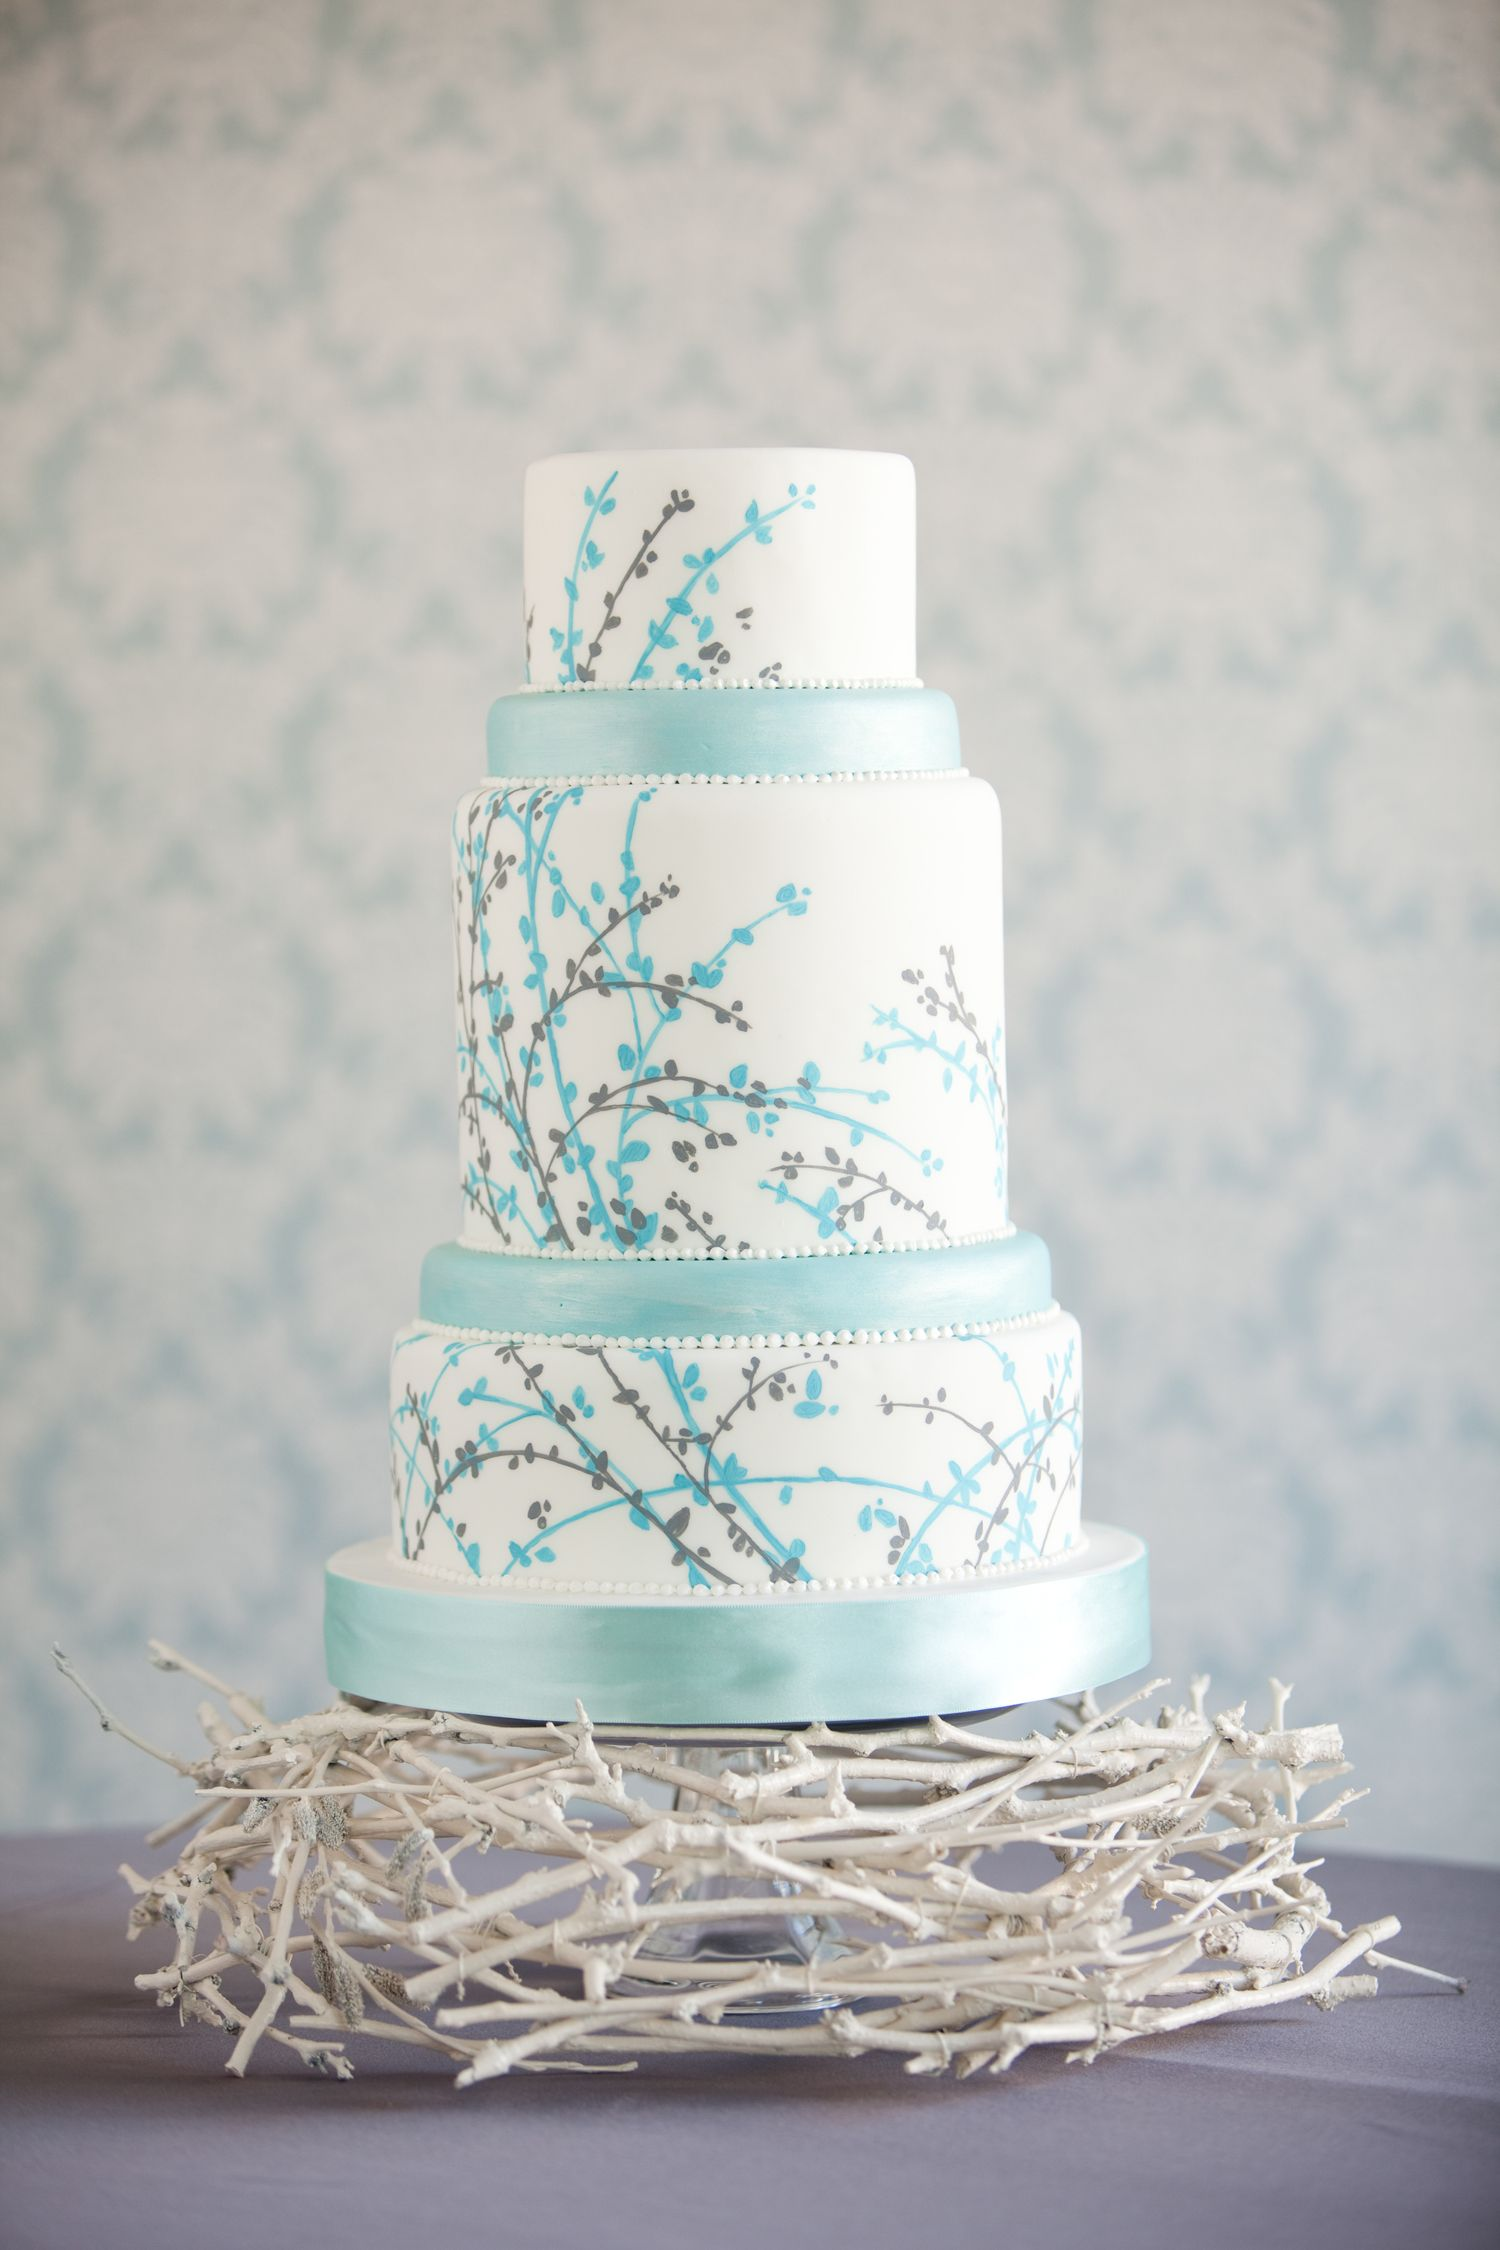 Handpainted wedding cake aqua seaglass pale turquoise